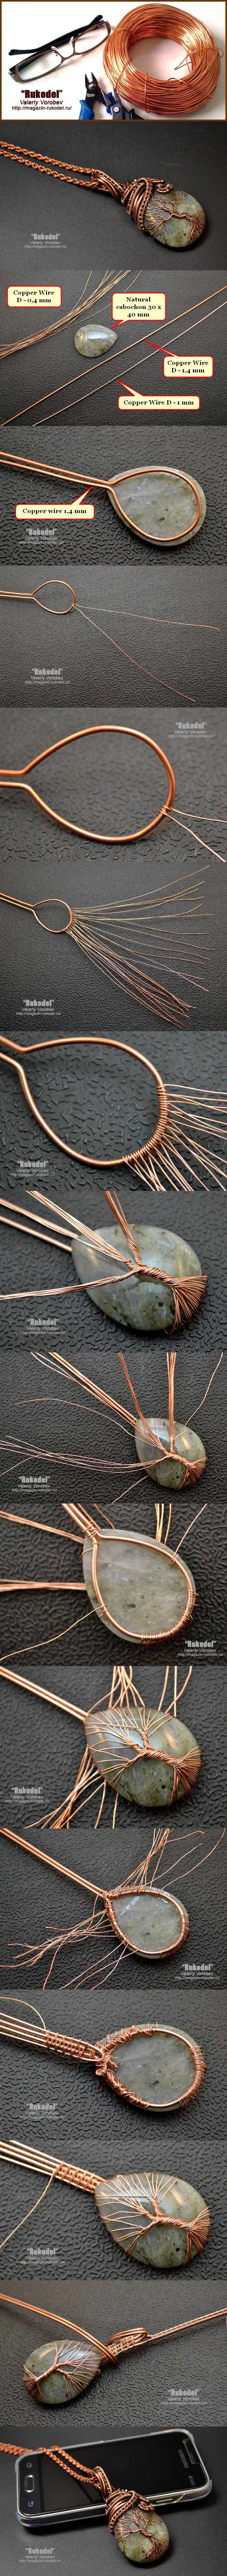 DIY JEWELRY - Simple Wire Wrap Tree Tutorial